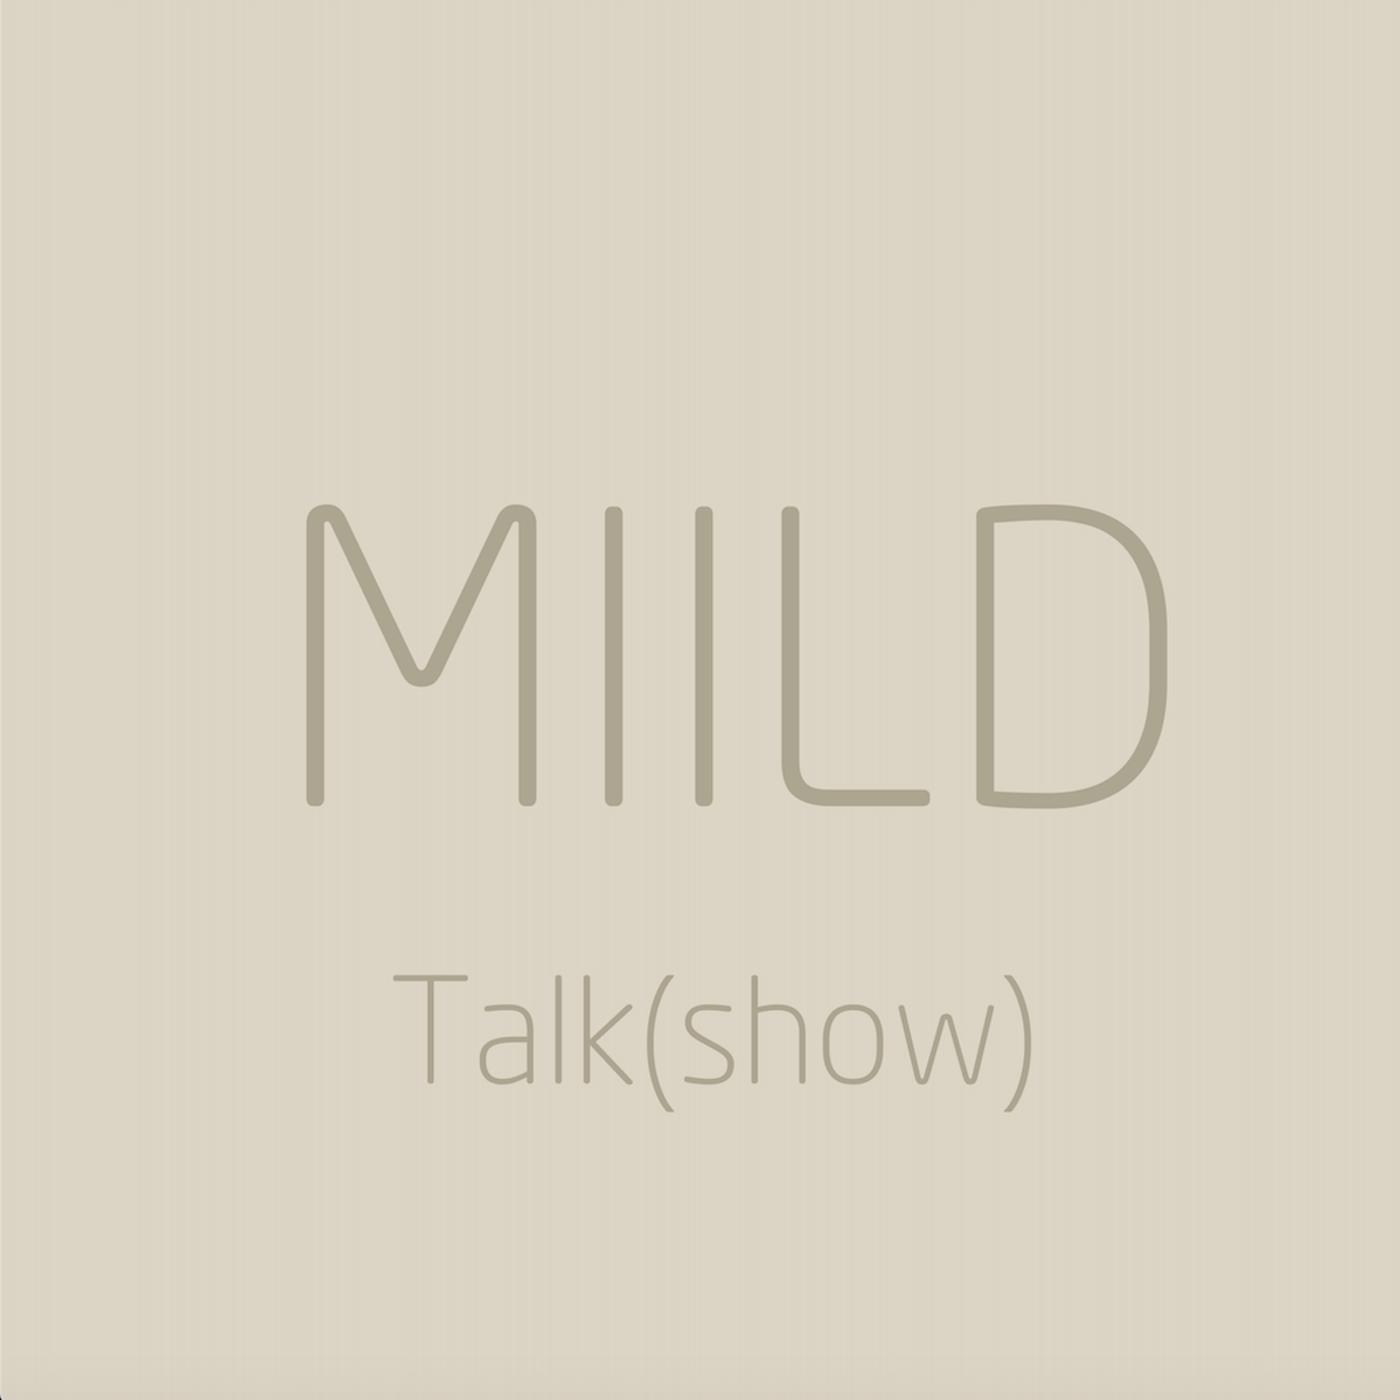 Miild Talk (show) show art